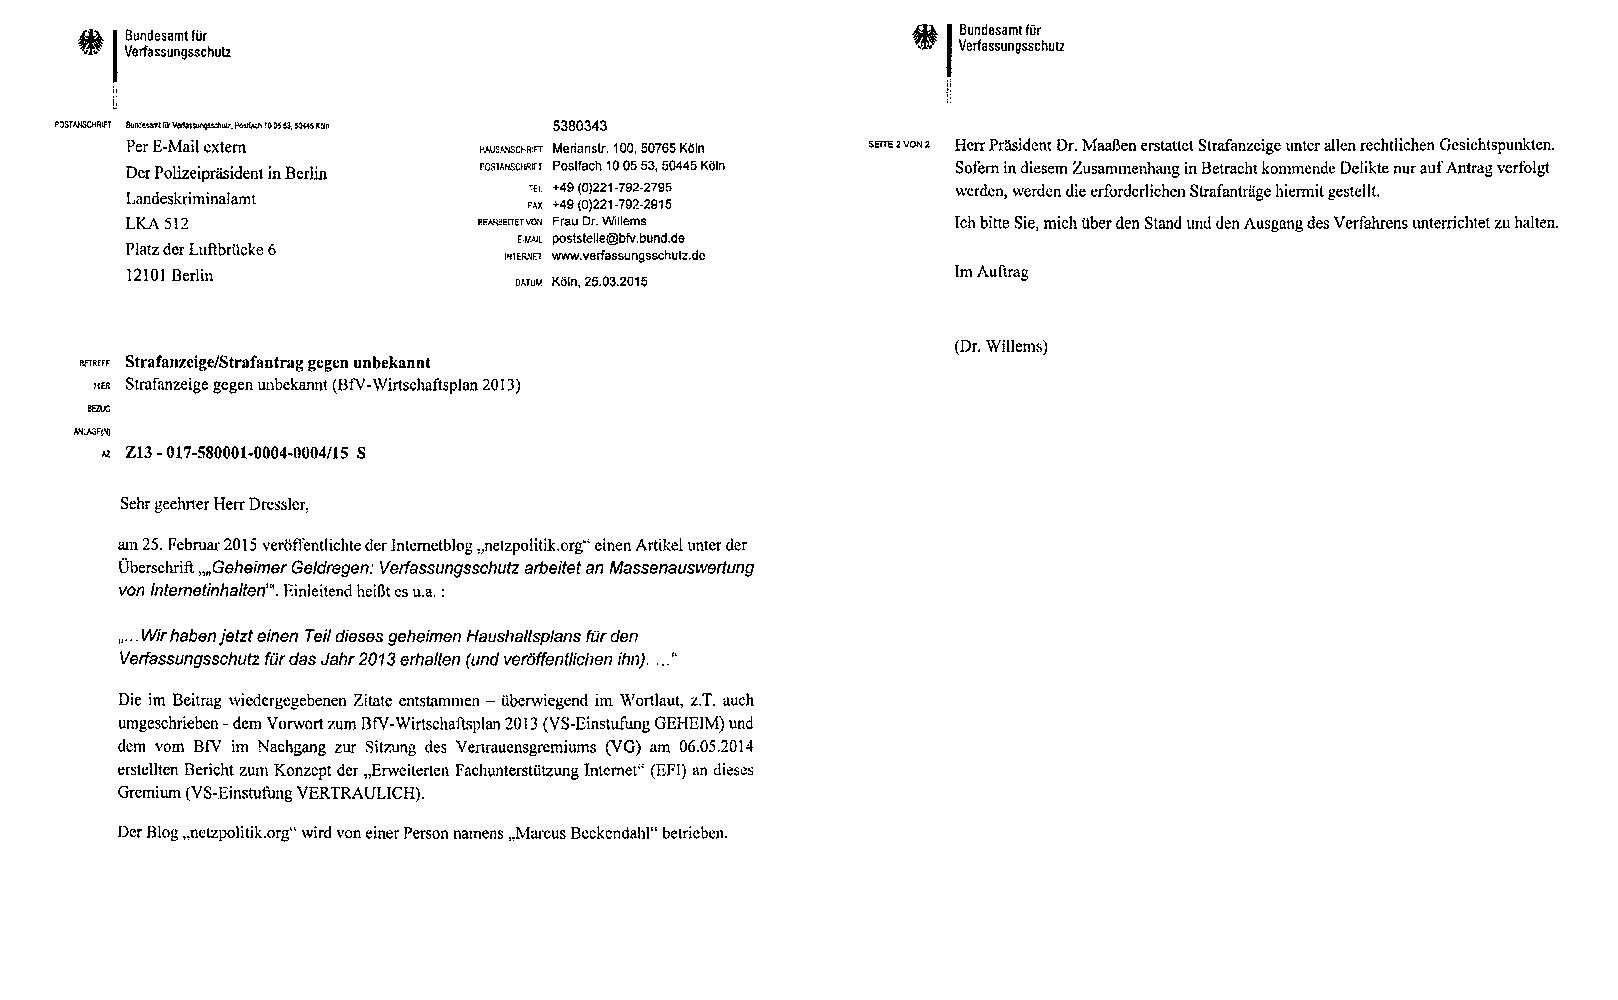 2015-03-25_BfV-LKA-Strafanzeige-Landesverrat